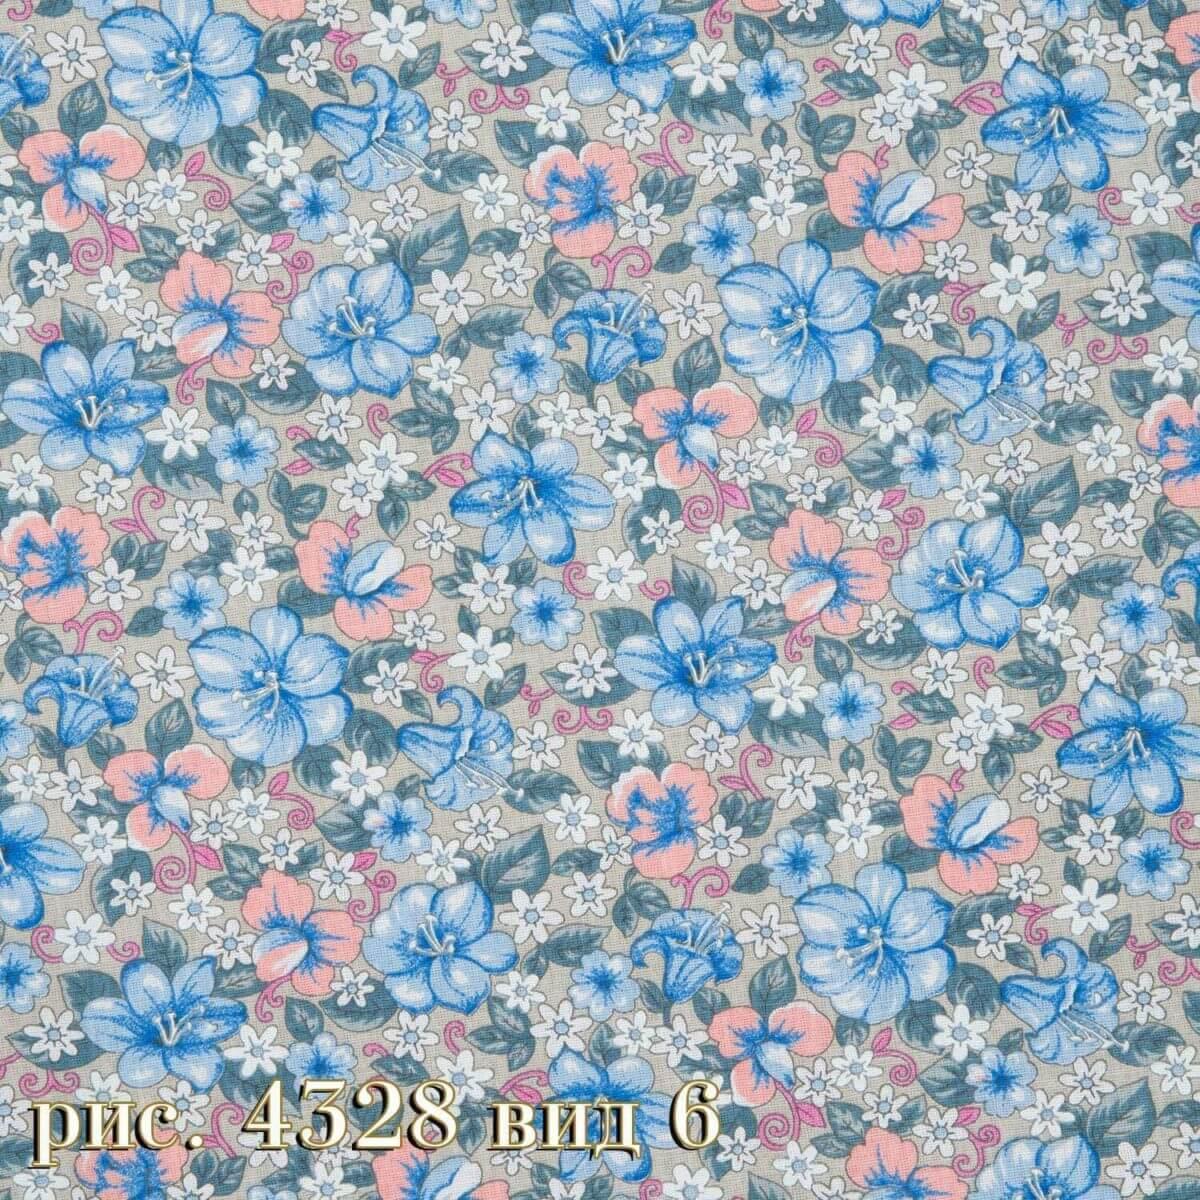 Фото 19 - Плательная ткань бязь 150 см (4328/3) Под заказ.